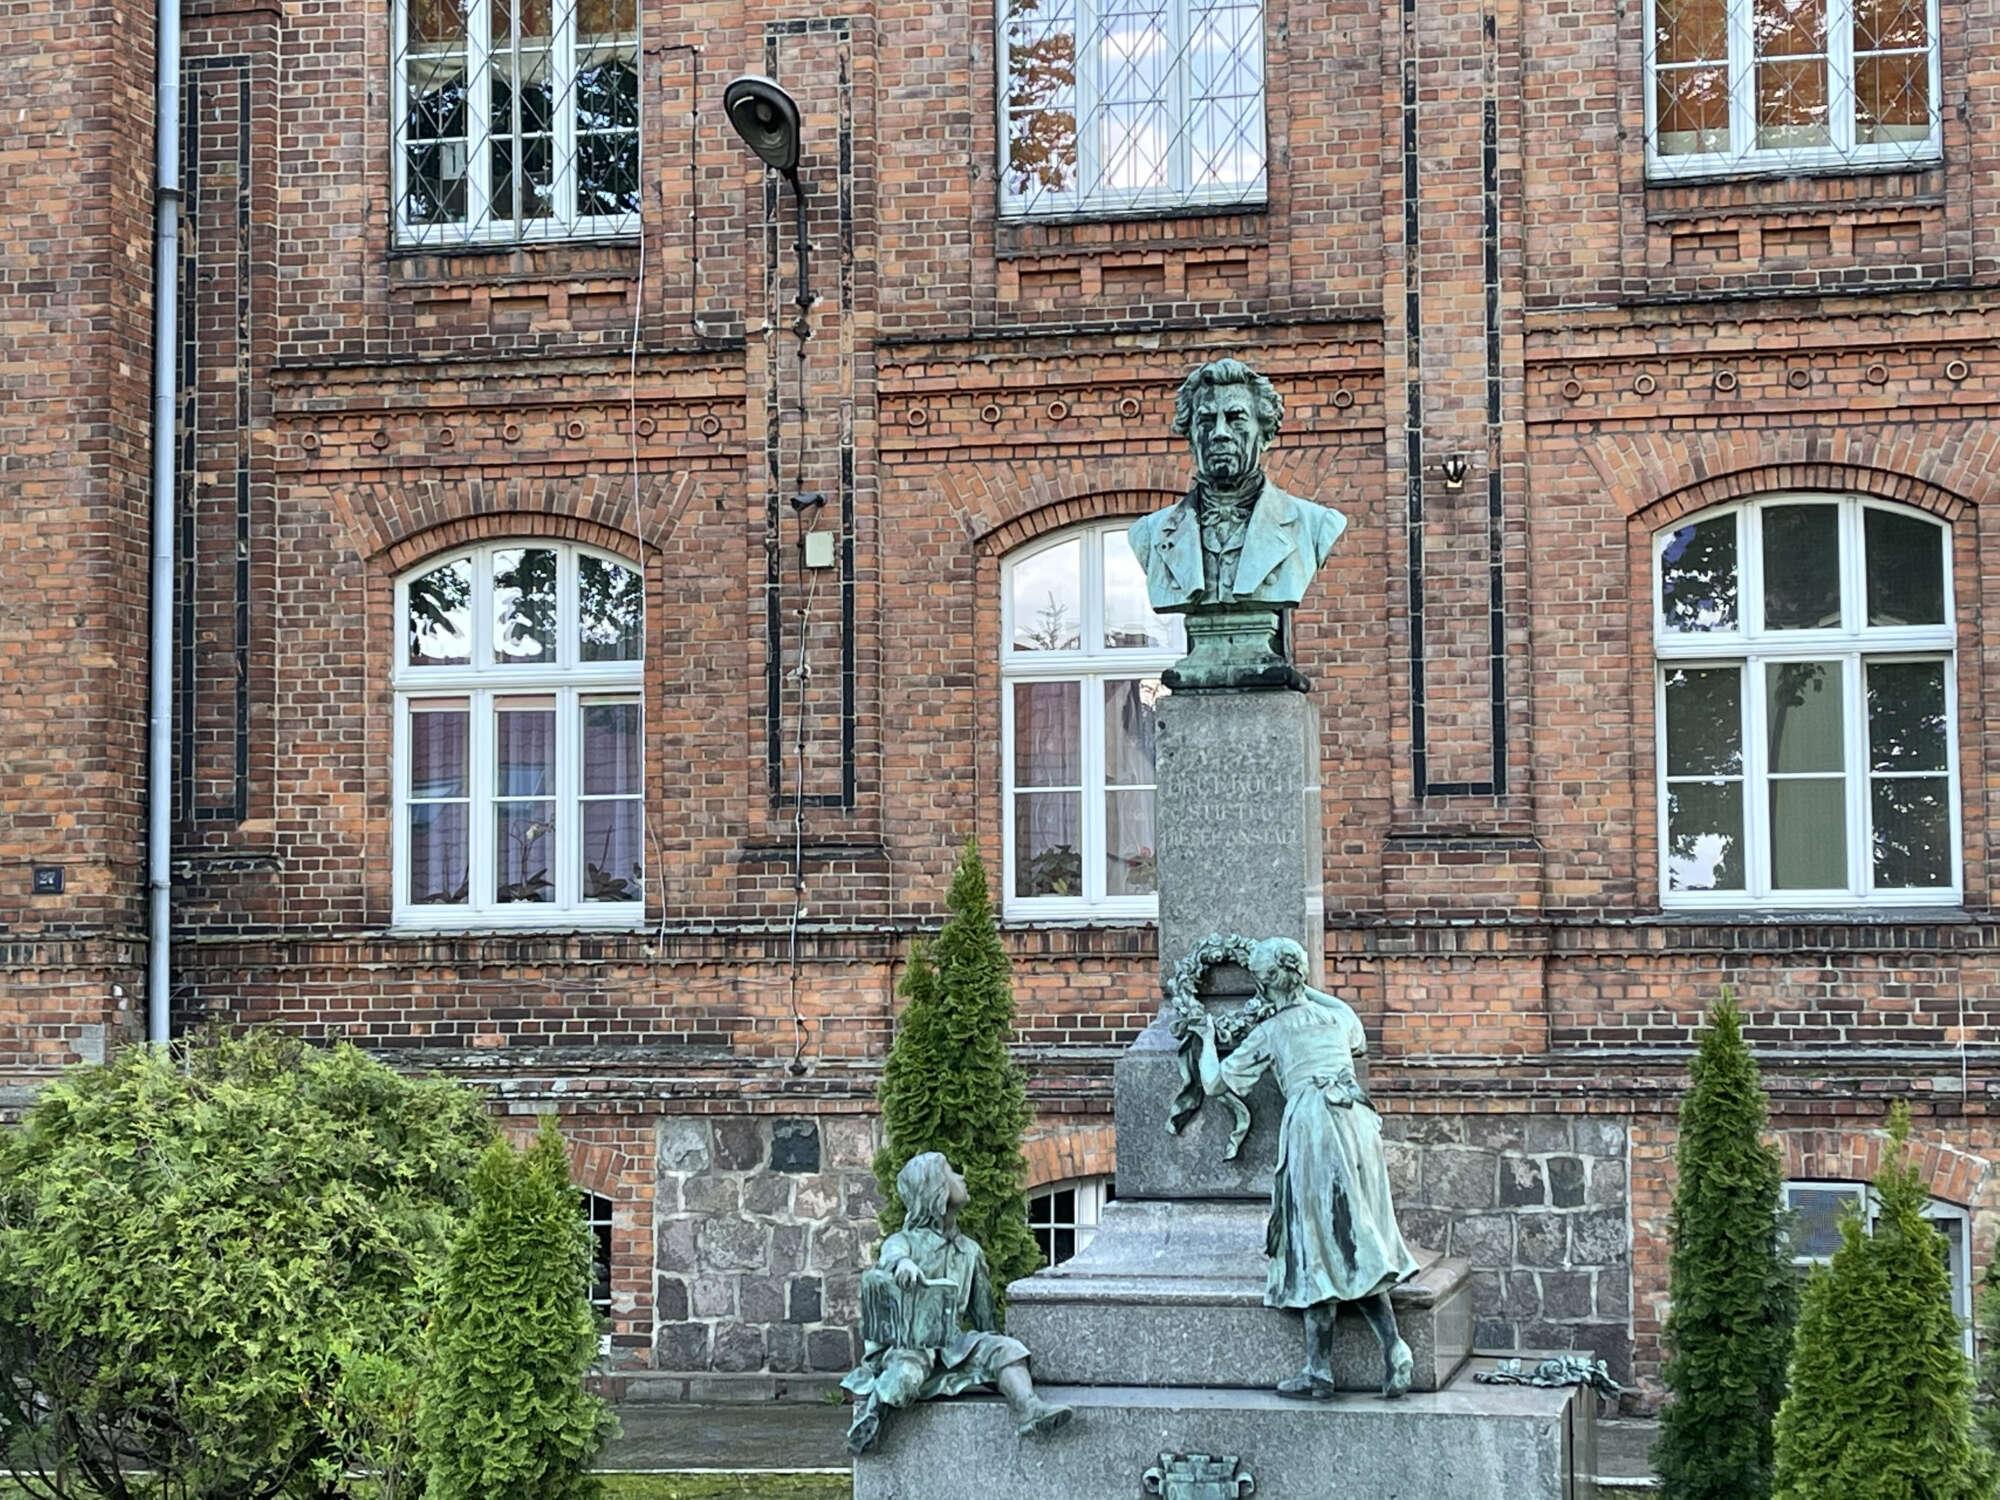 Pomnik fundatora DPS w Moryniu